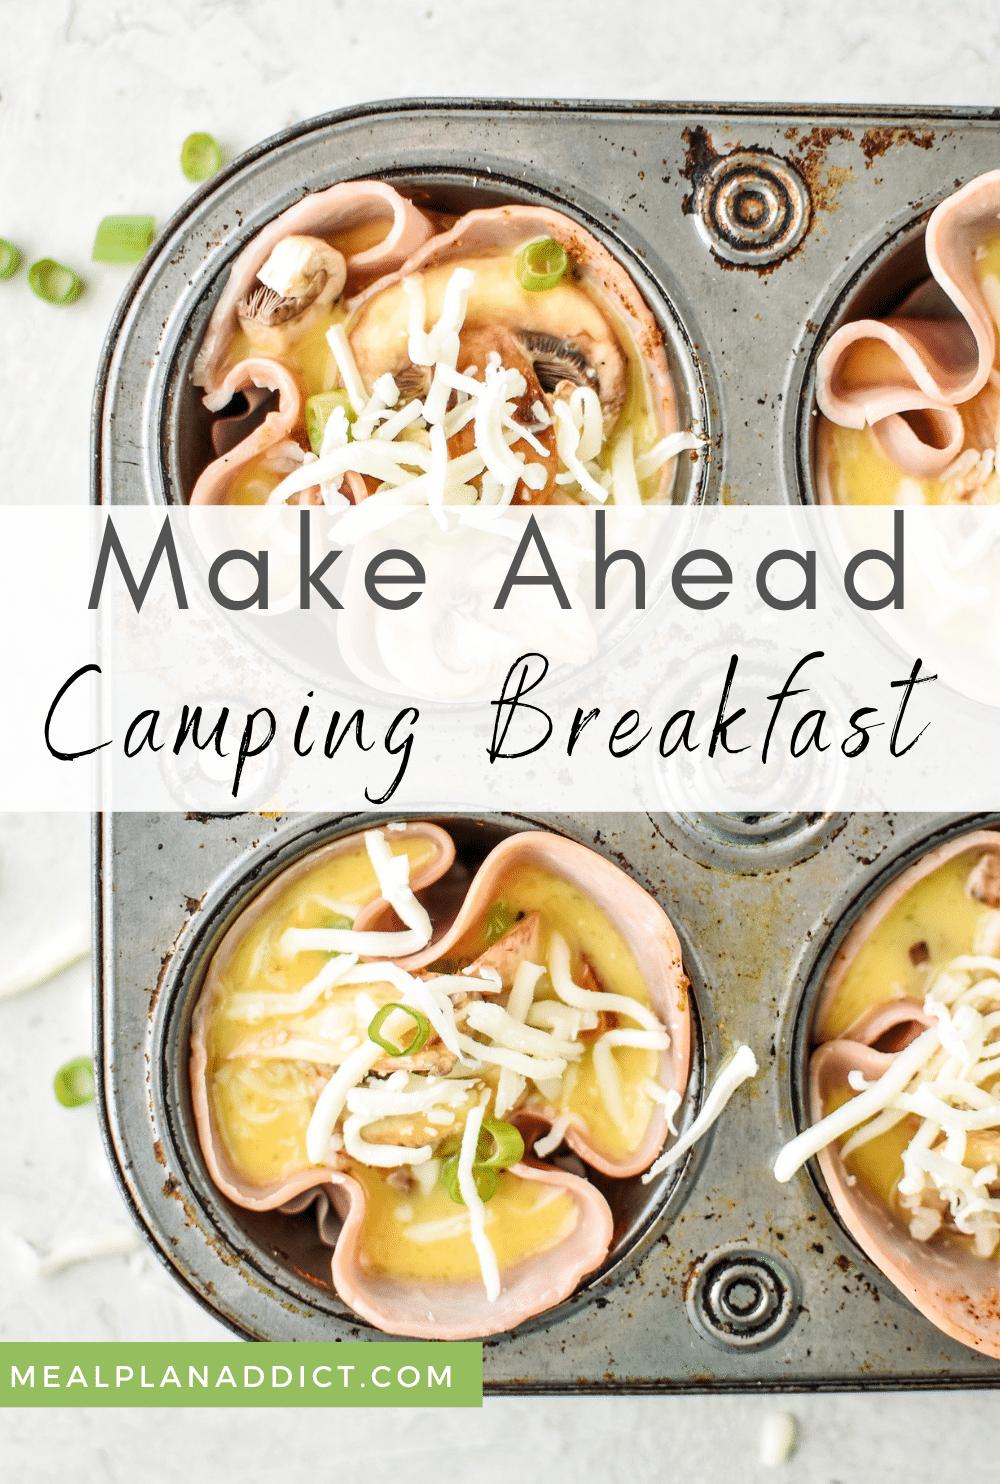 Healthy Make Ahead Camping Breakfast